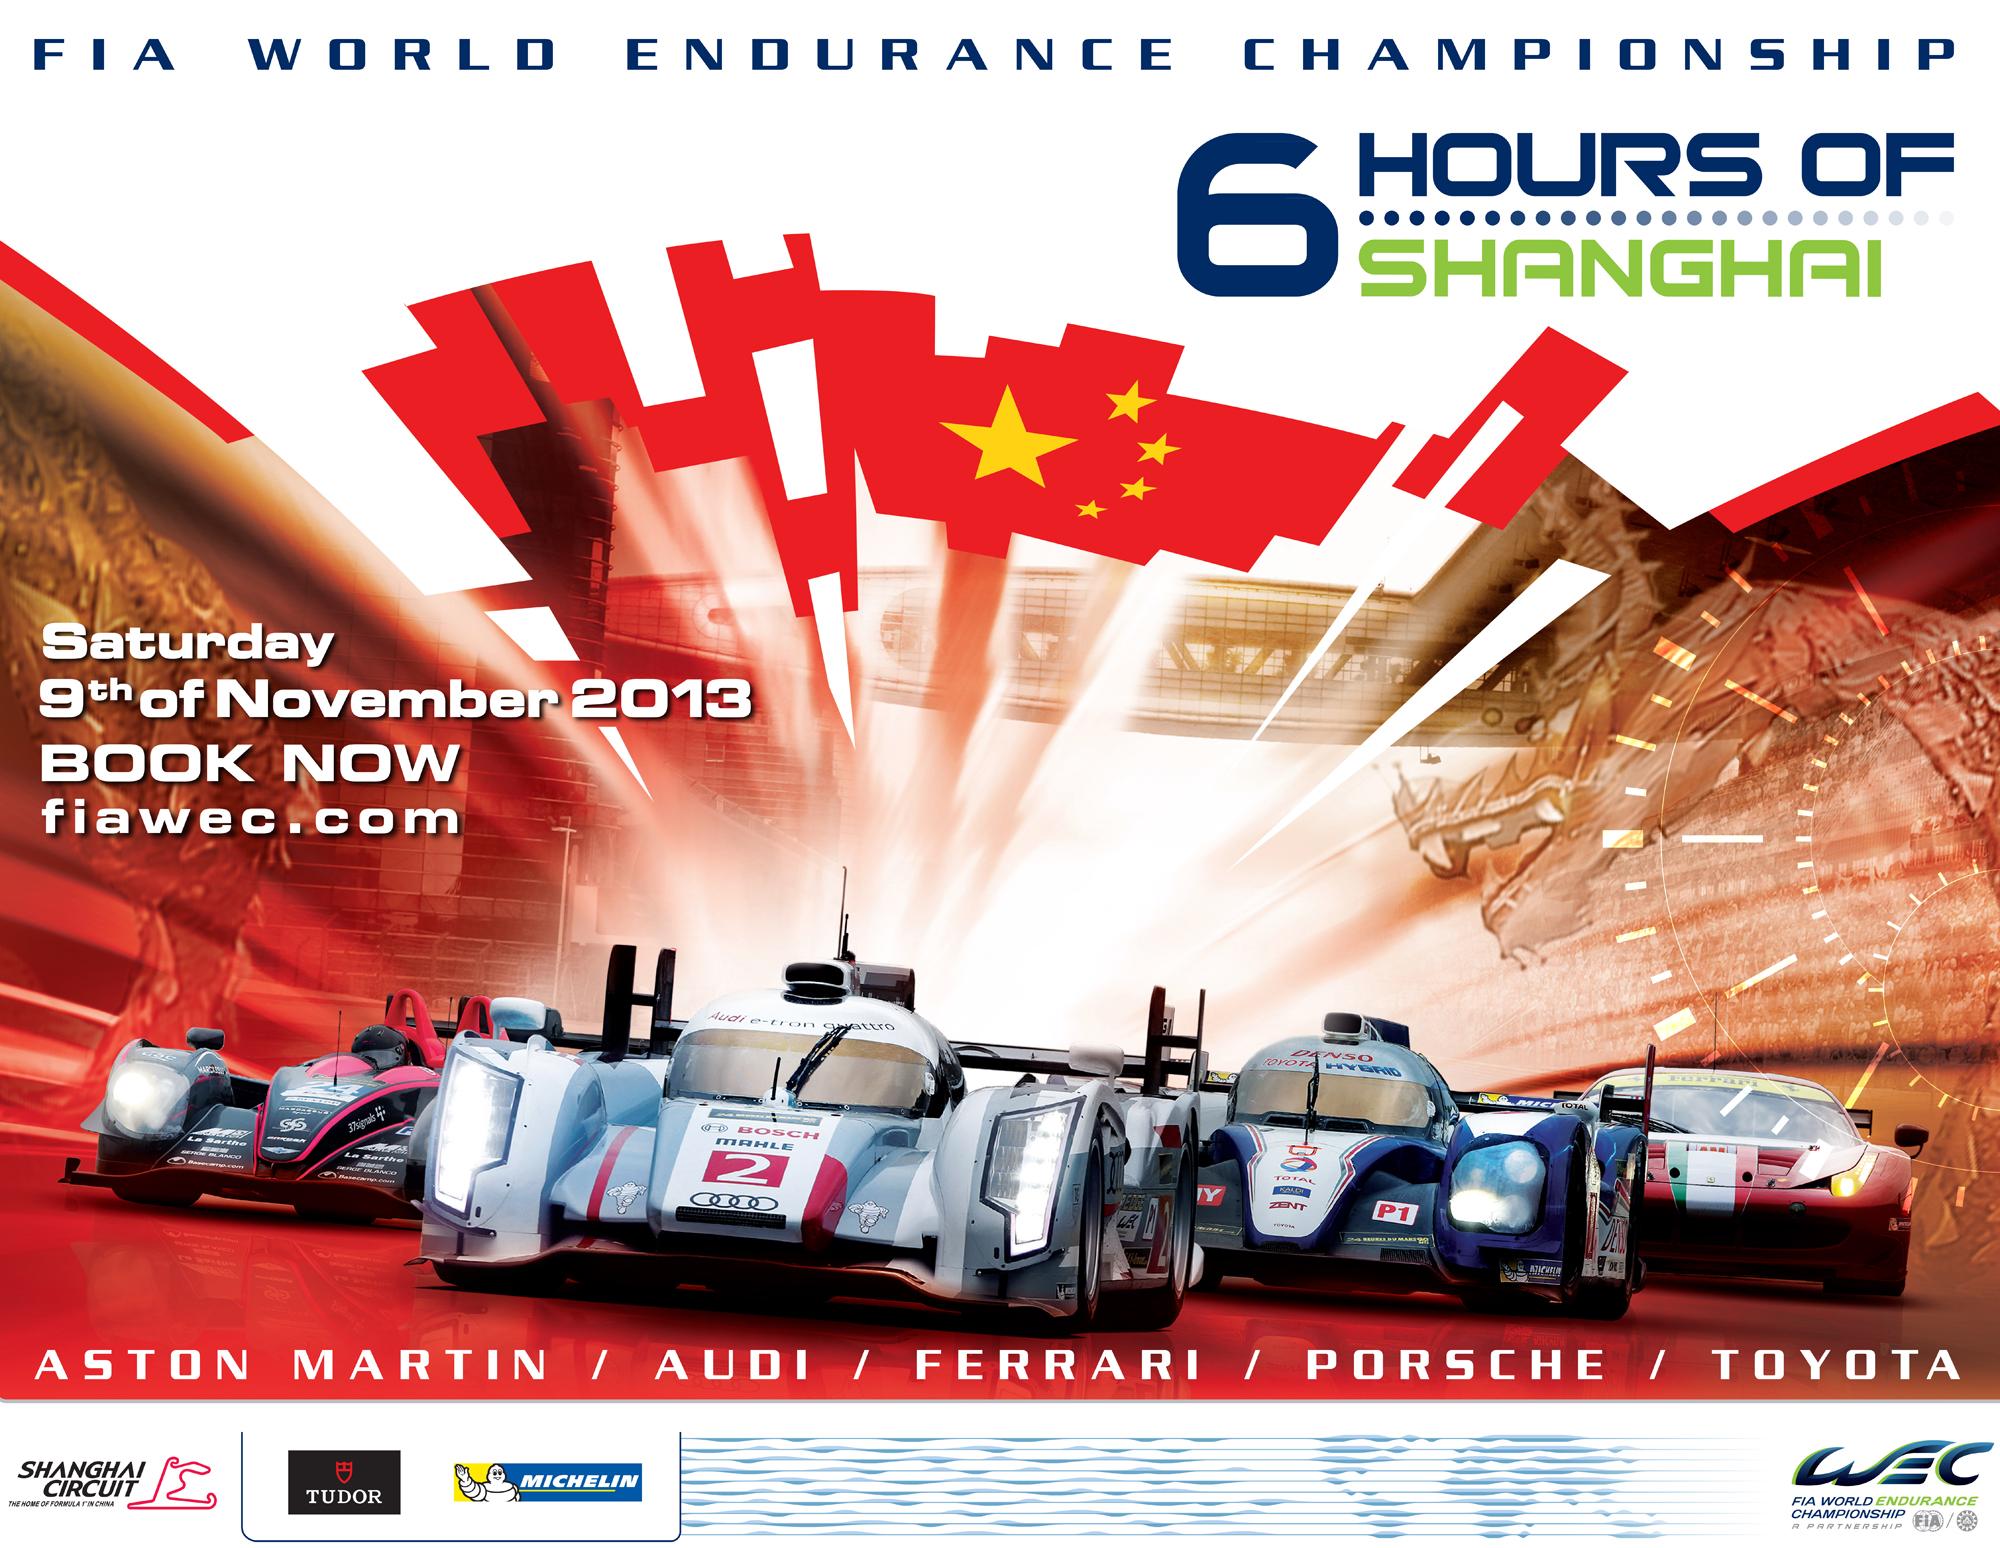 WEC_AFFICHE_SHANGHAI_800x600_ENGLISH